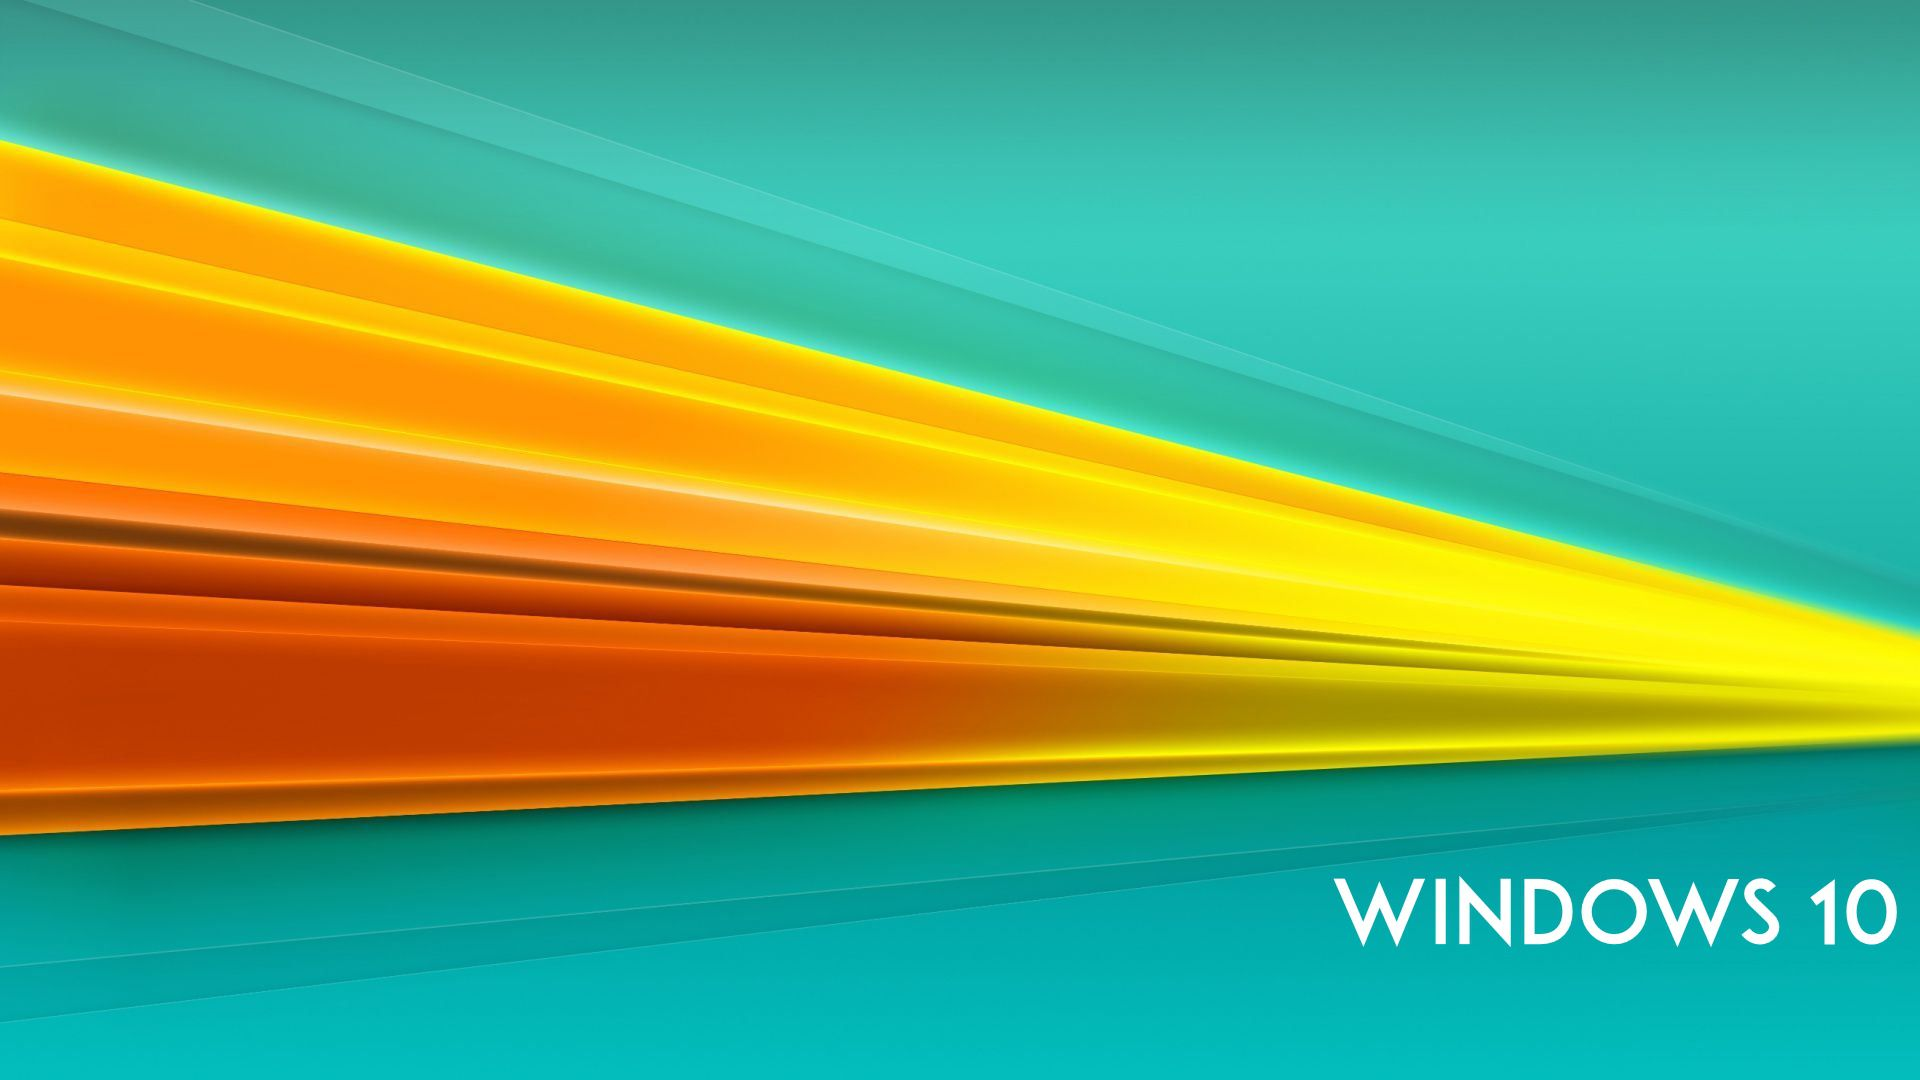 Wallpaper download for windows 10 - Hd Windows 10 Wallpapers Download Graffies